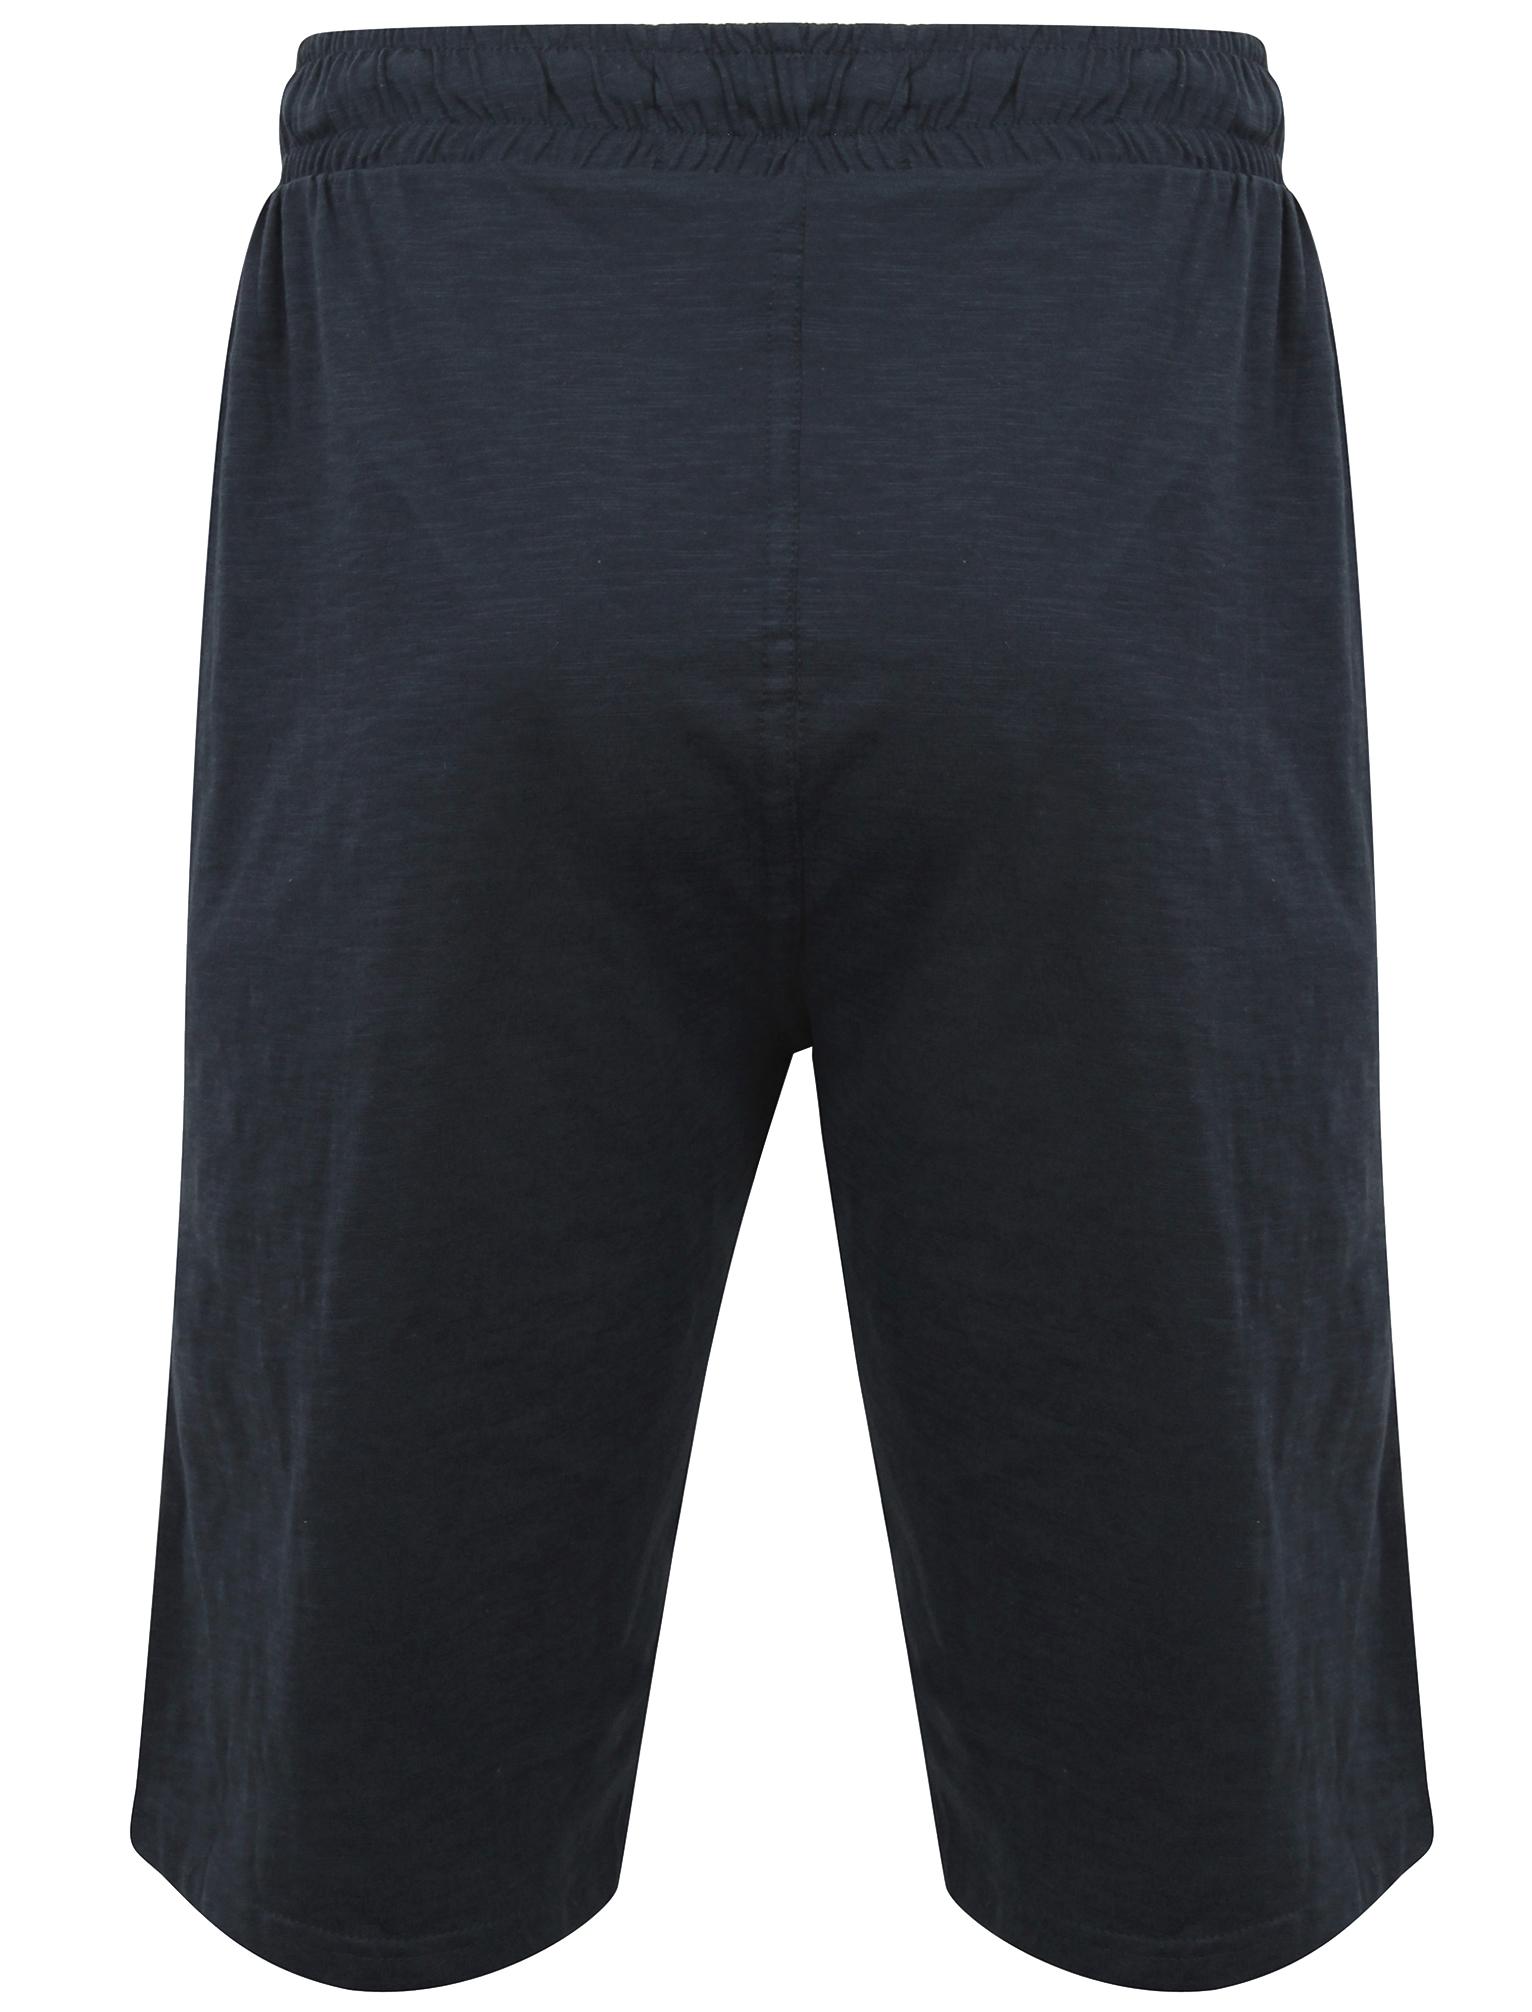 Tokyo-Laundry-Men-039-s-Gough-Cotton-Short-Sleeve-Pyjamas-PJ-Shorts-Lounge-Wear-Set thumbnail 6